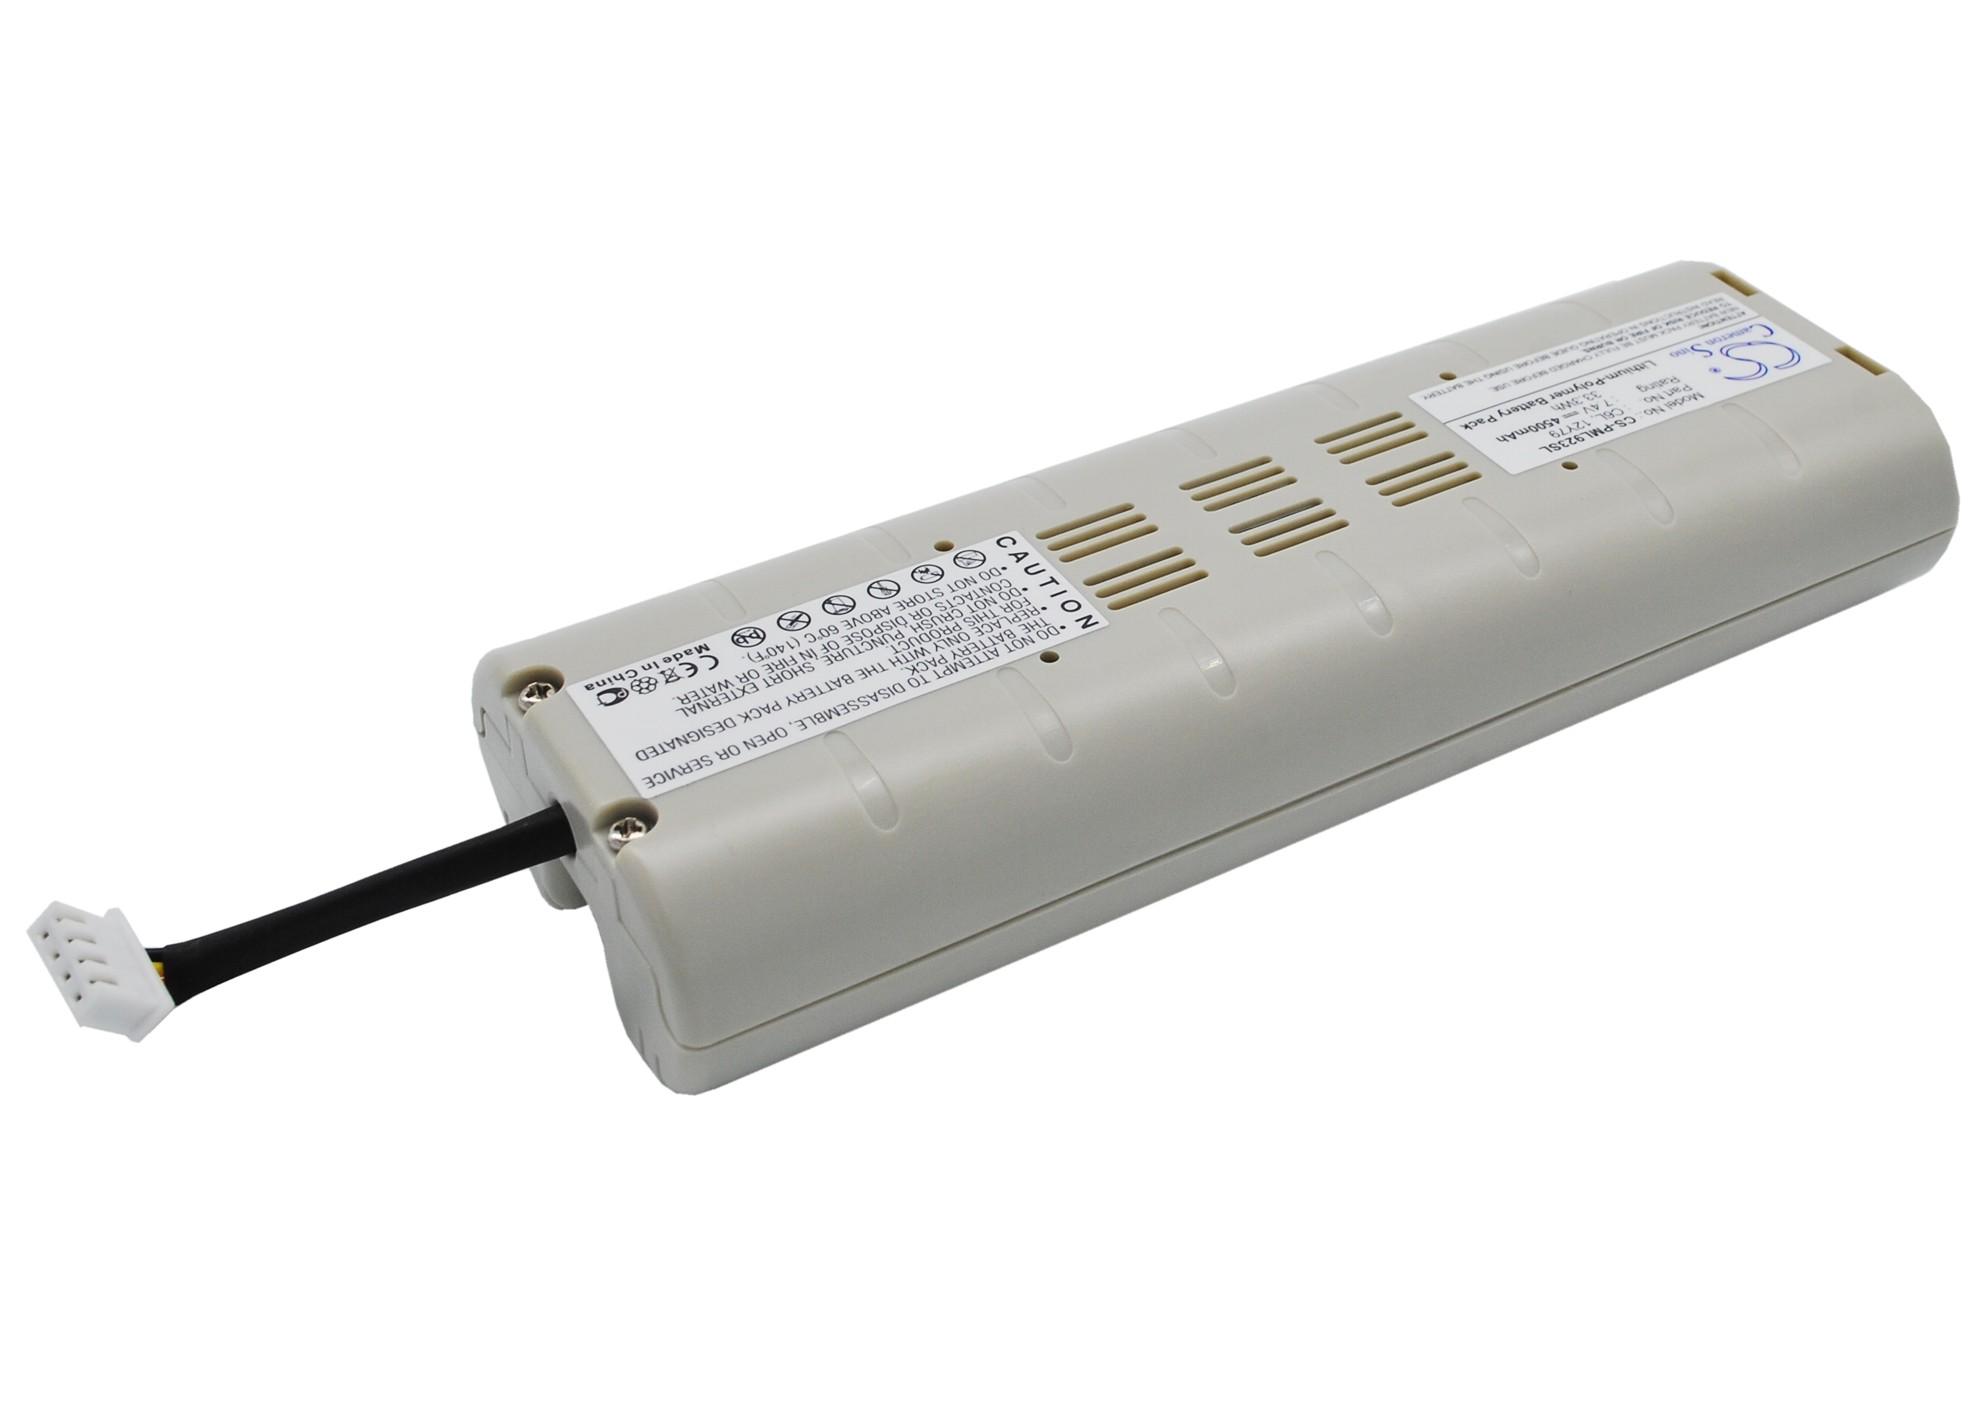 Cameron Sino baterie do digitálních rádií pro PURE Evoke-2XT 7.4V Li-Polymer 4500mAh šedá bílá - neoriginální